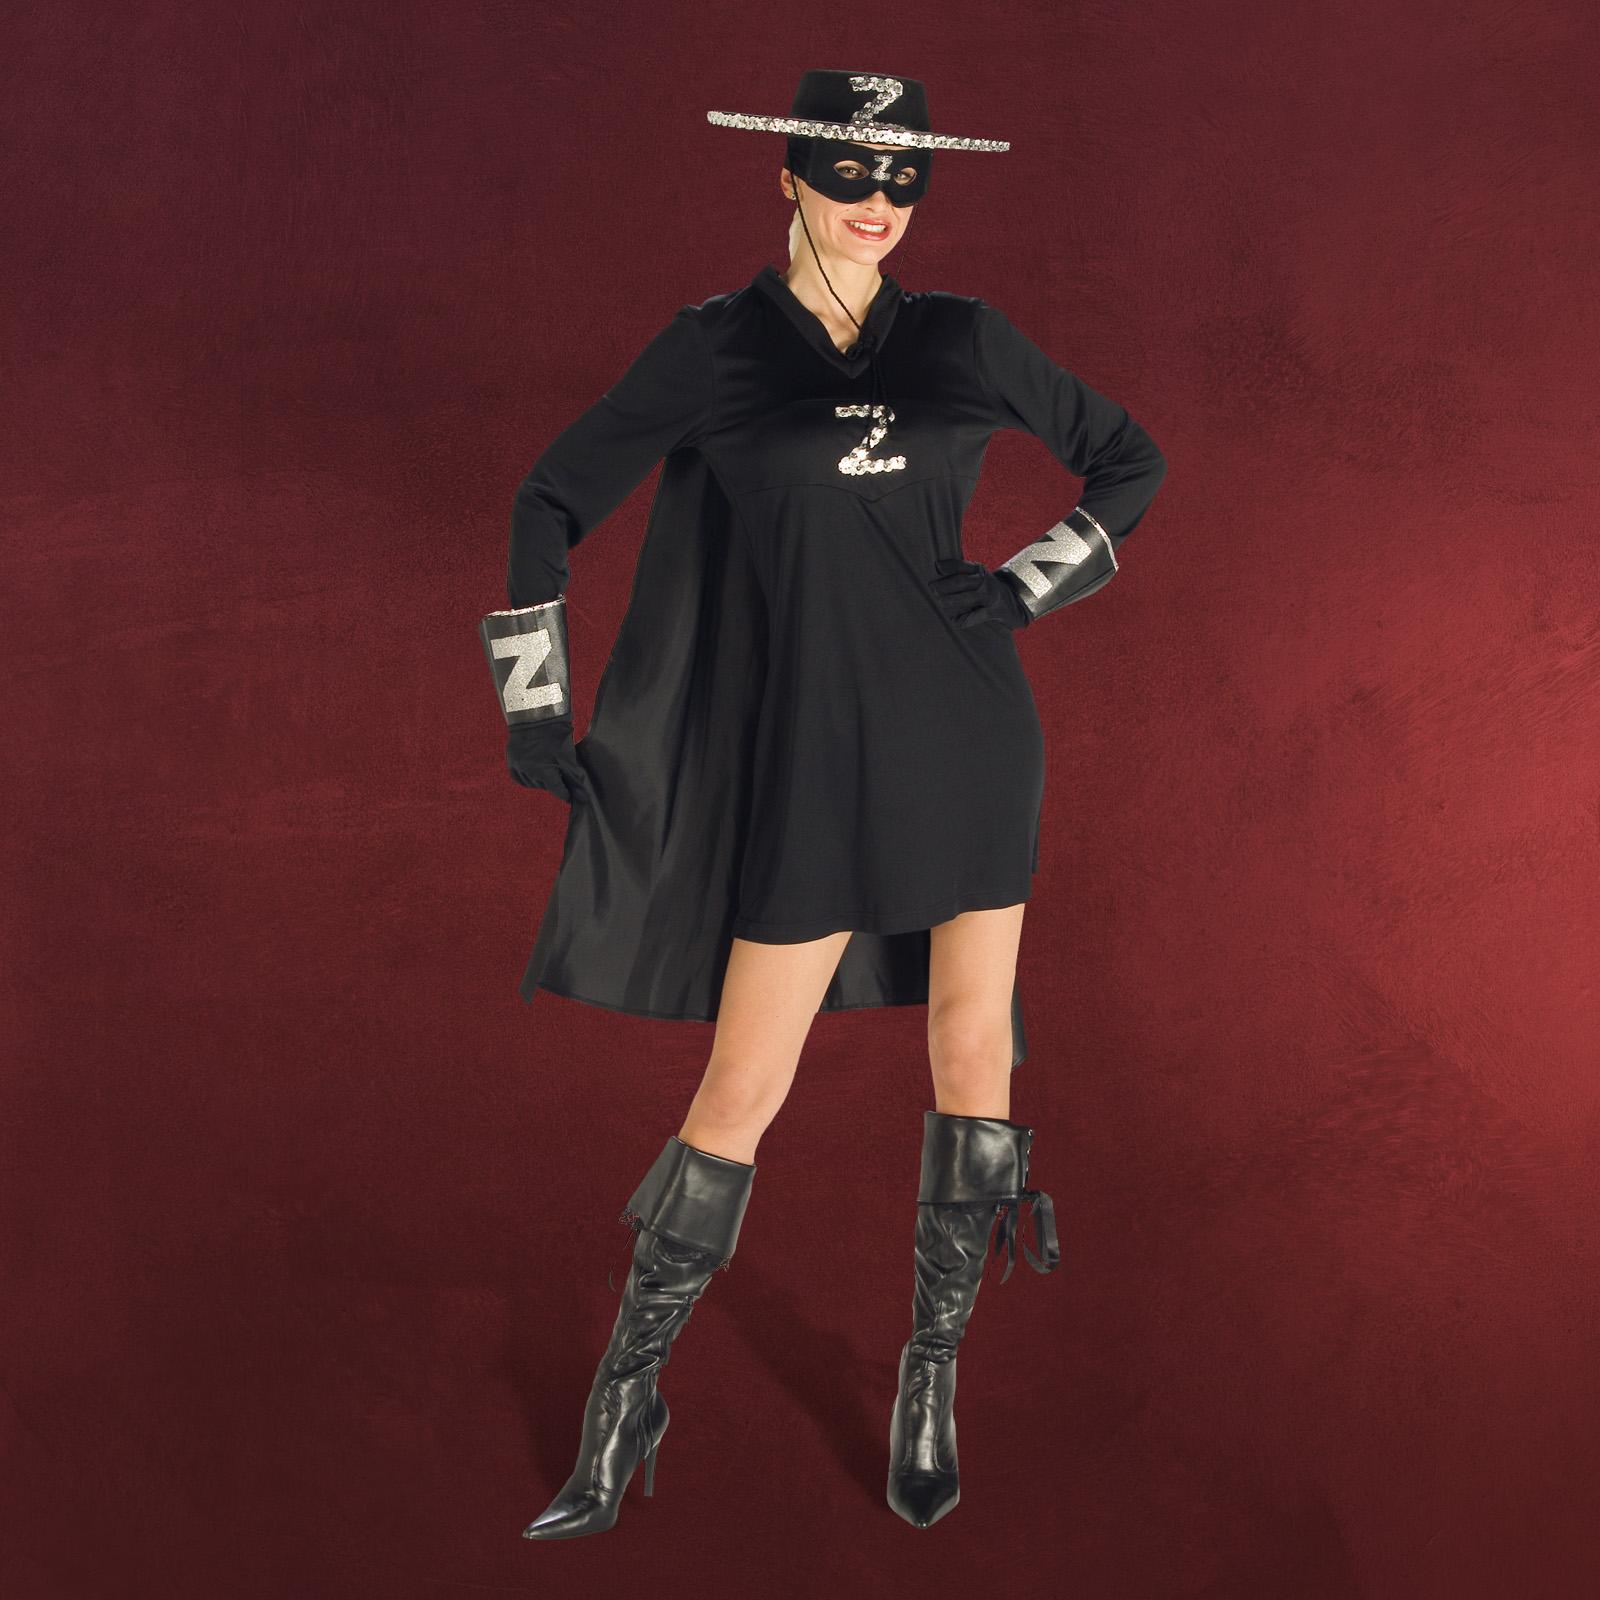 fasching karneval damenkost m zorro lady kleid u cape ebay. Black Bedroom Furniture Sets. Home Design Ideas